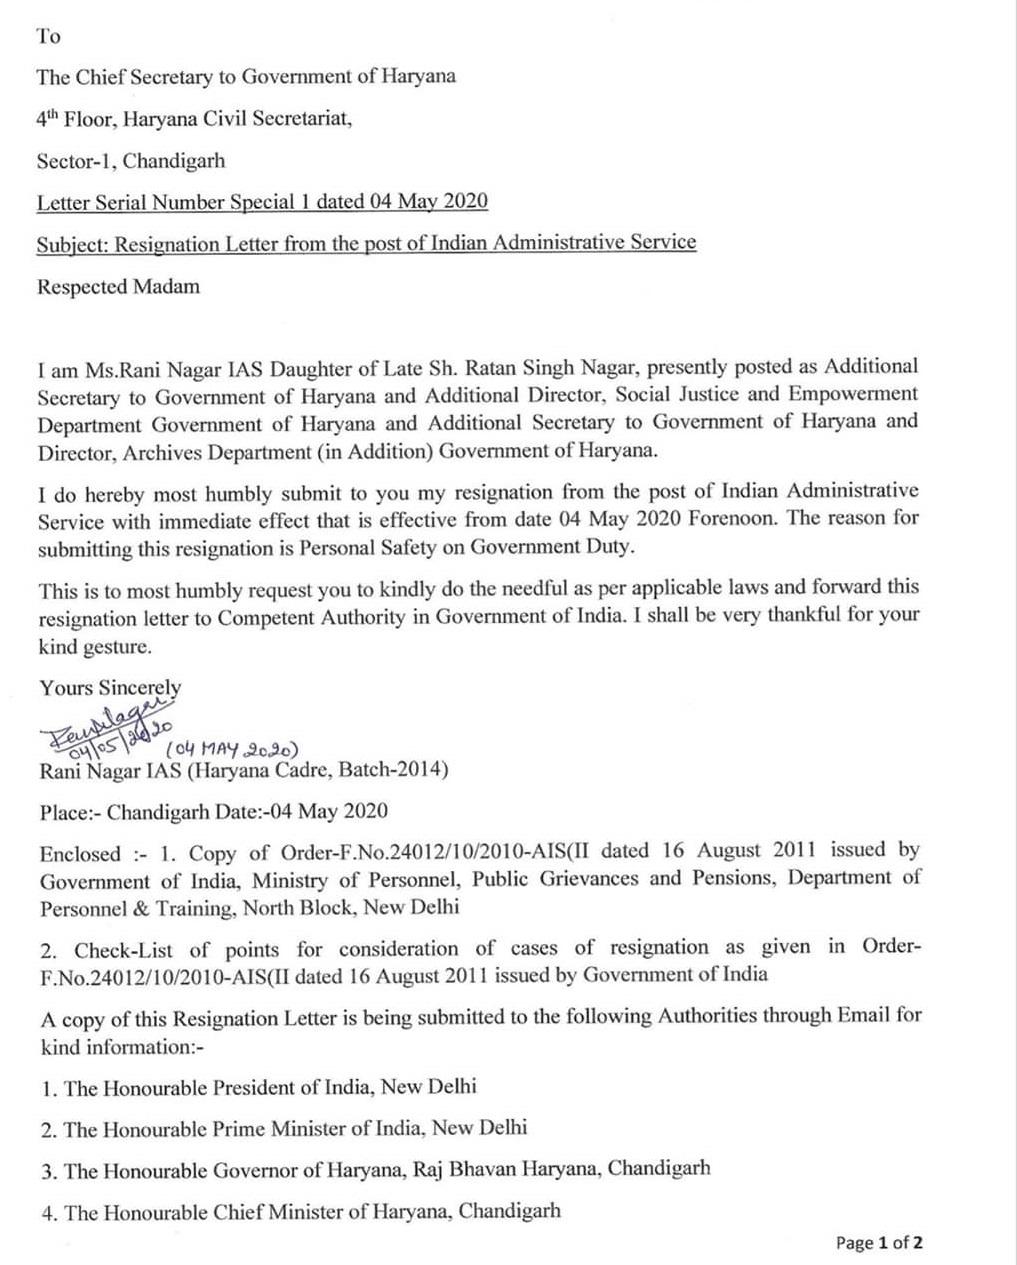 IAS Rani Nagar Resigns